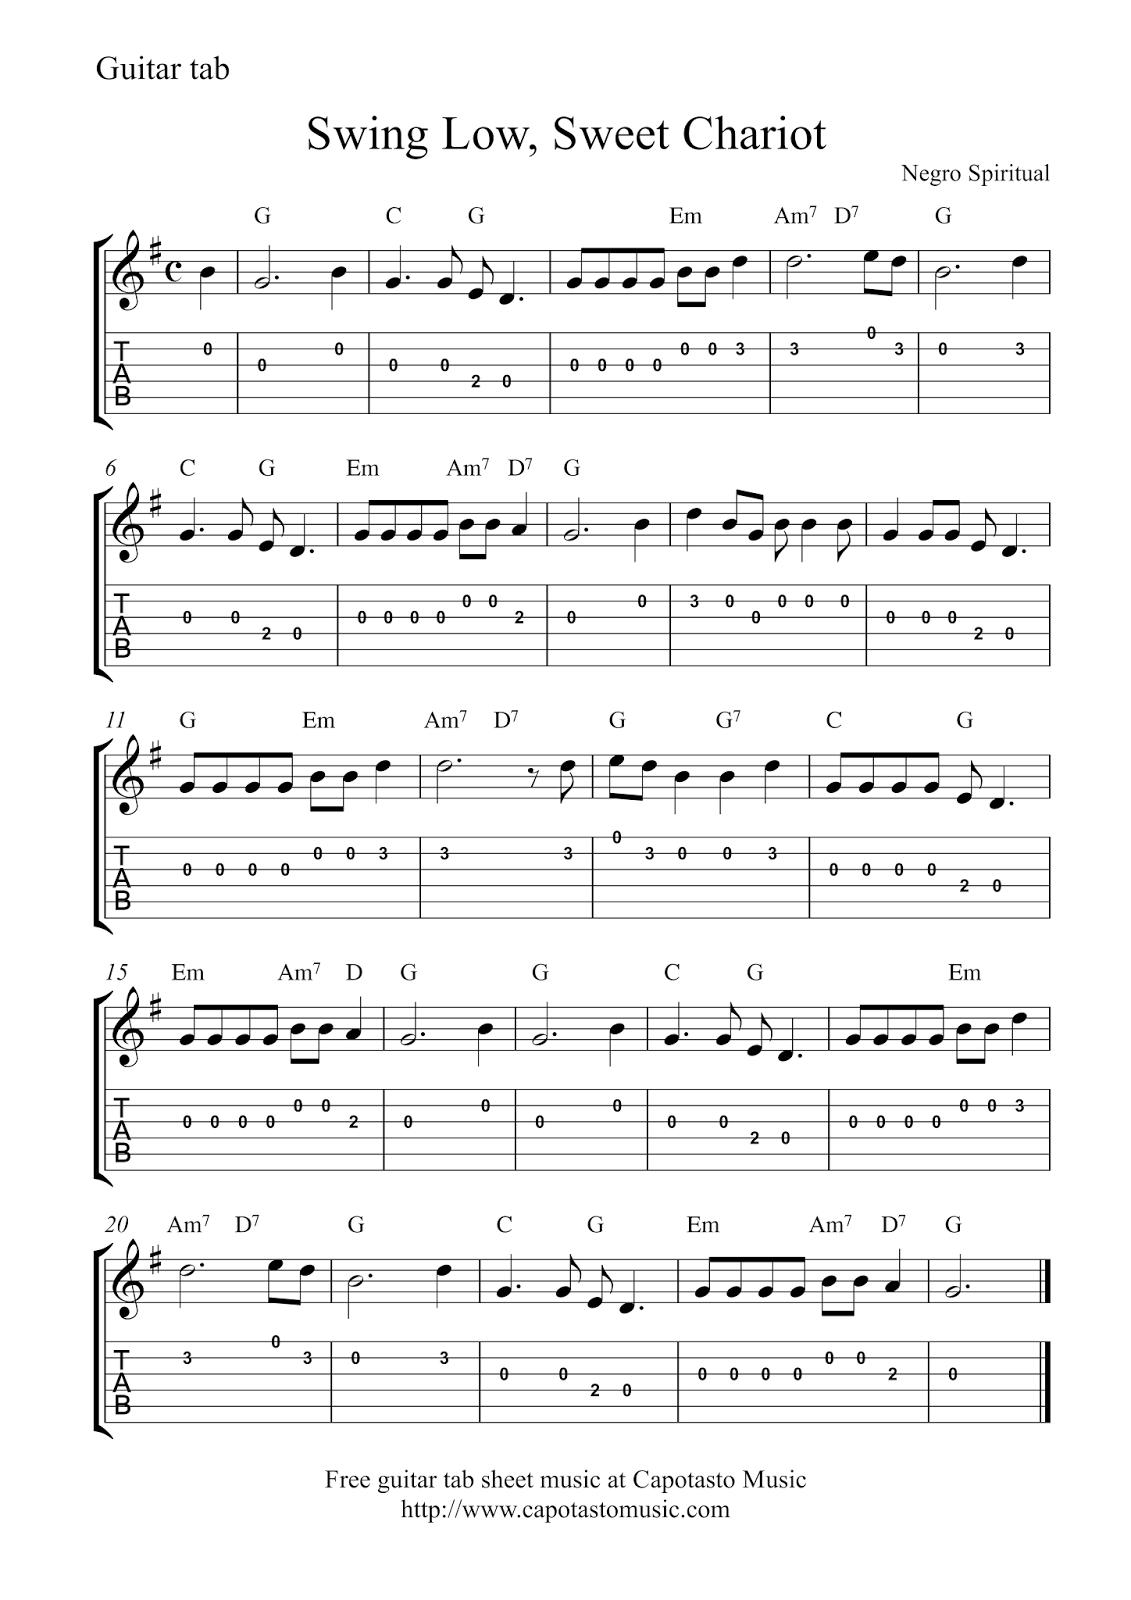 Pin By Helge Jeppesen On Music Sheet S In